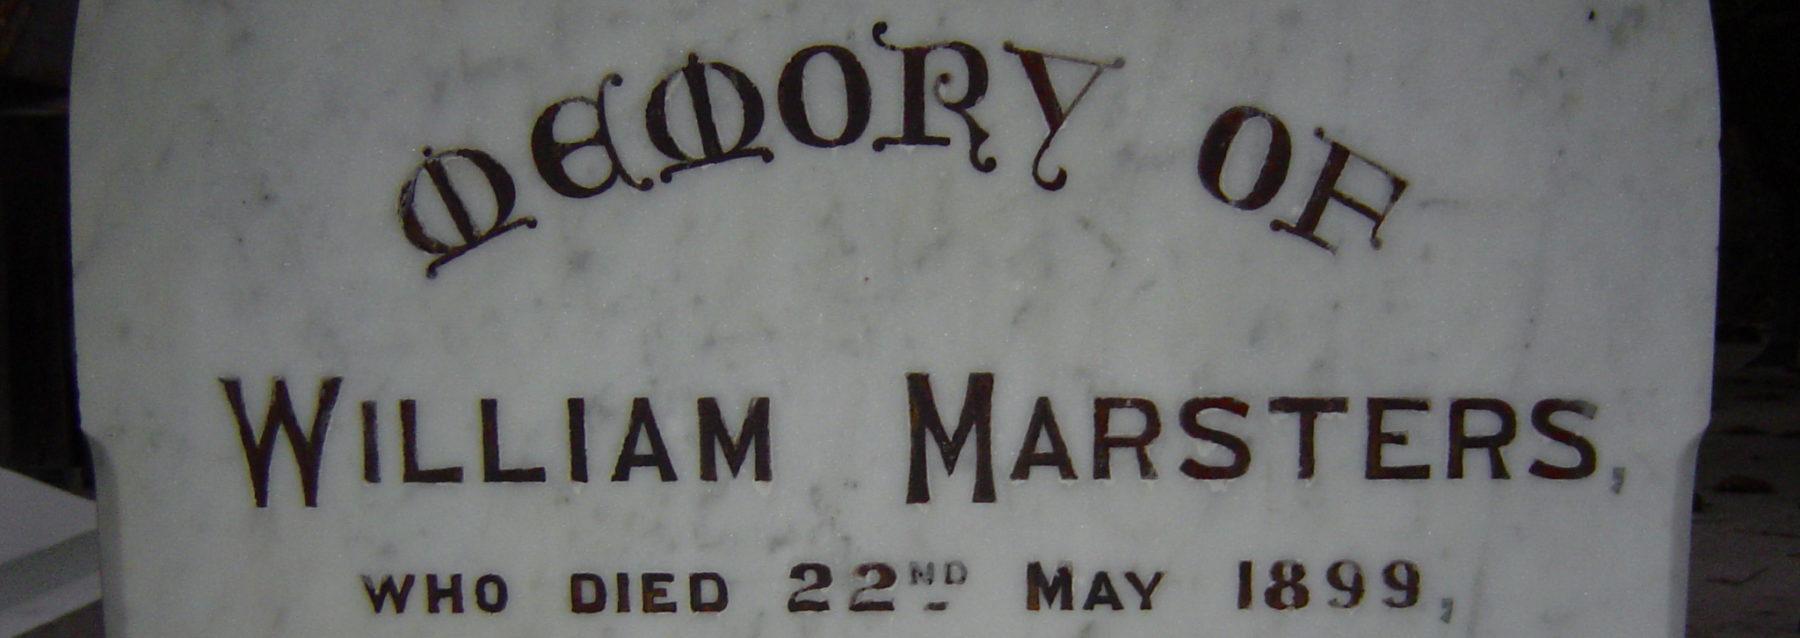 William R. Marsters